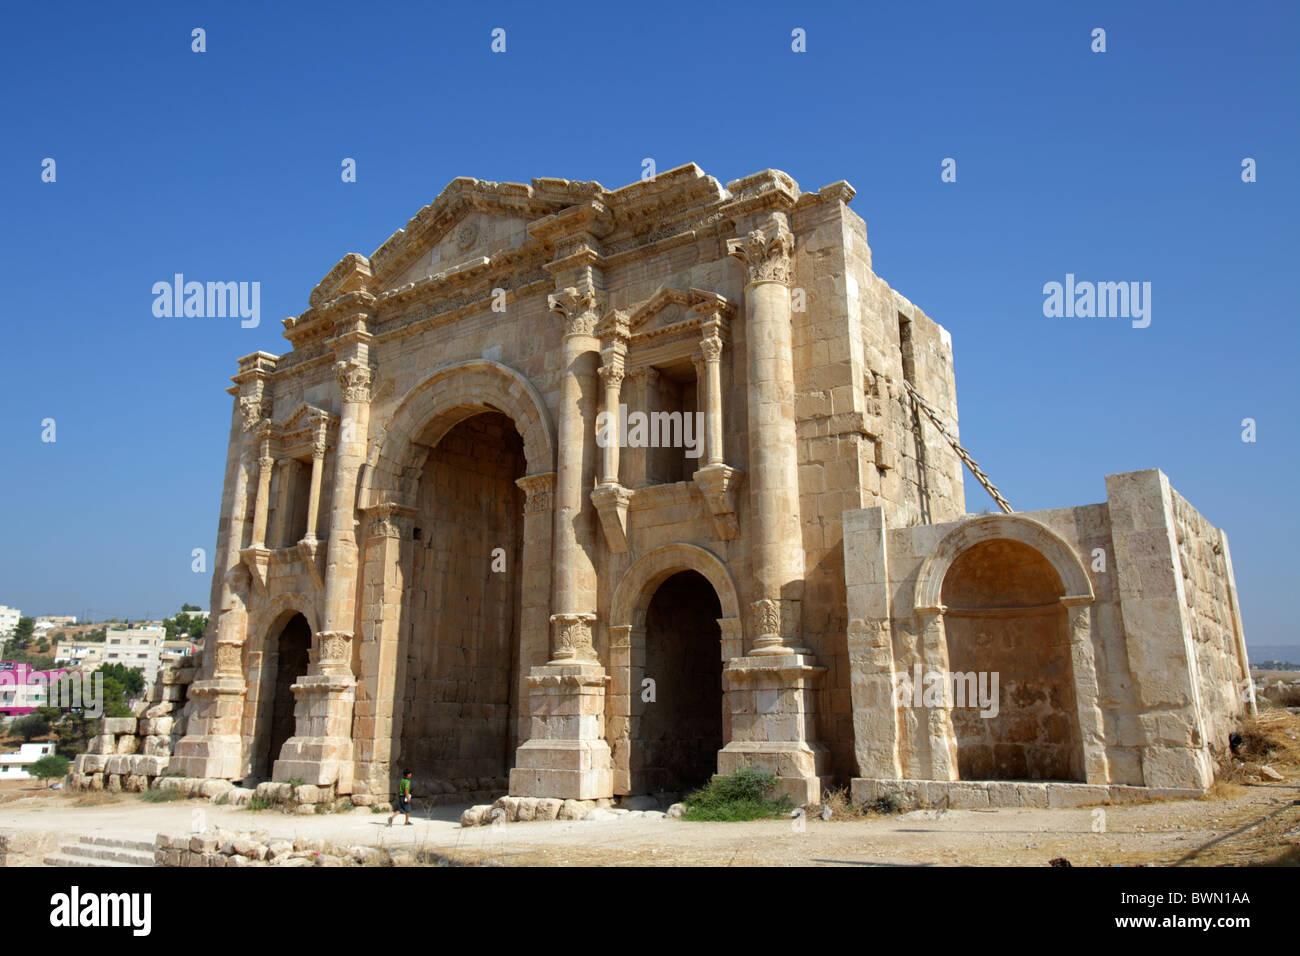 The Arch of Hadrian, Jerash Jordan - Stock Image